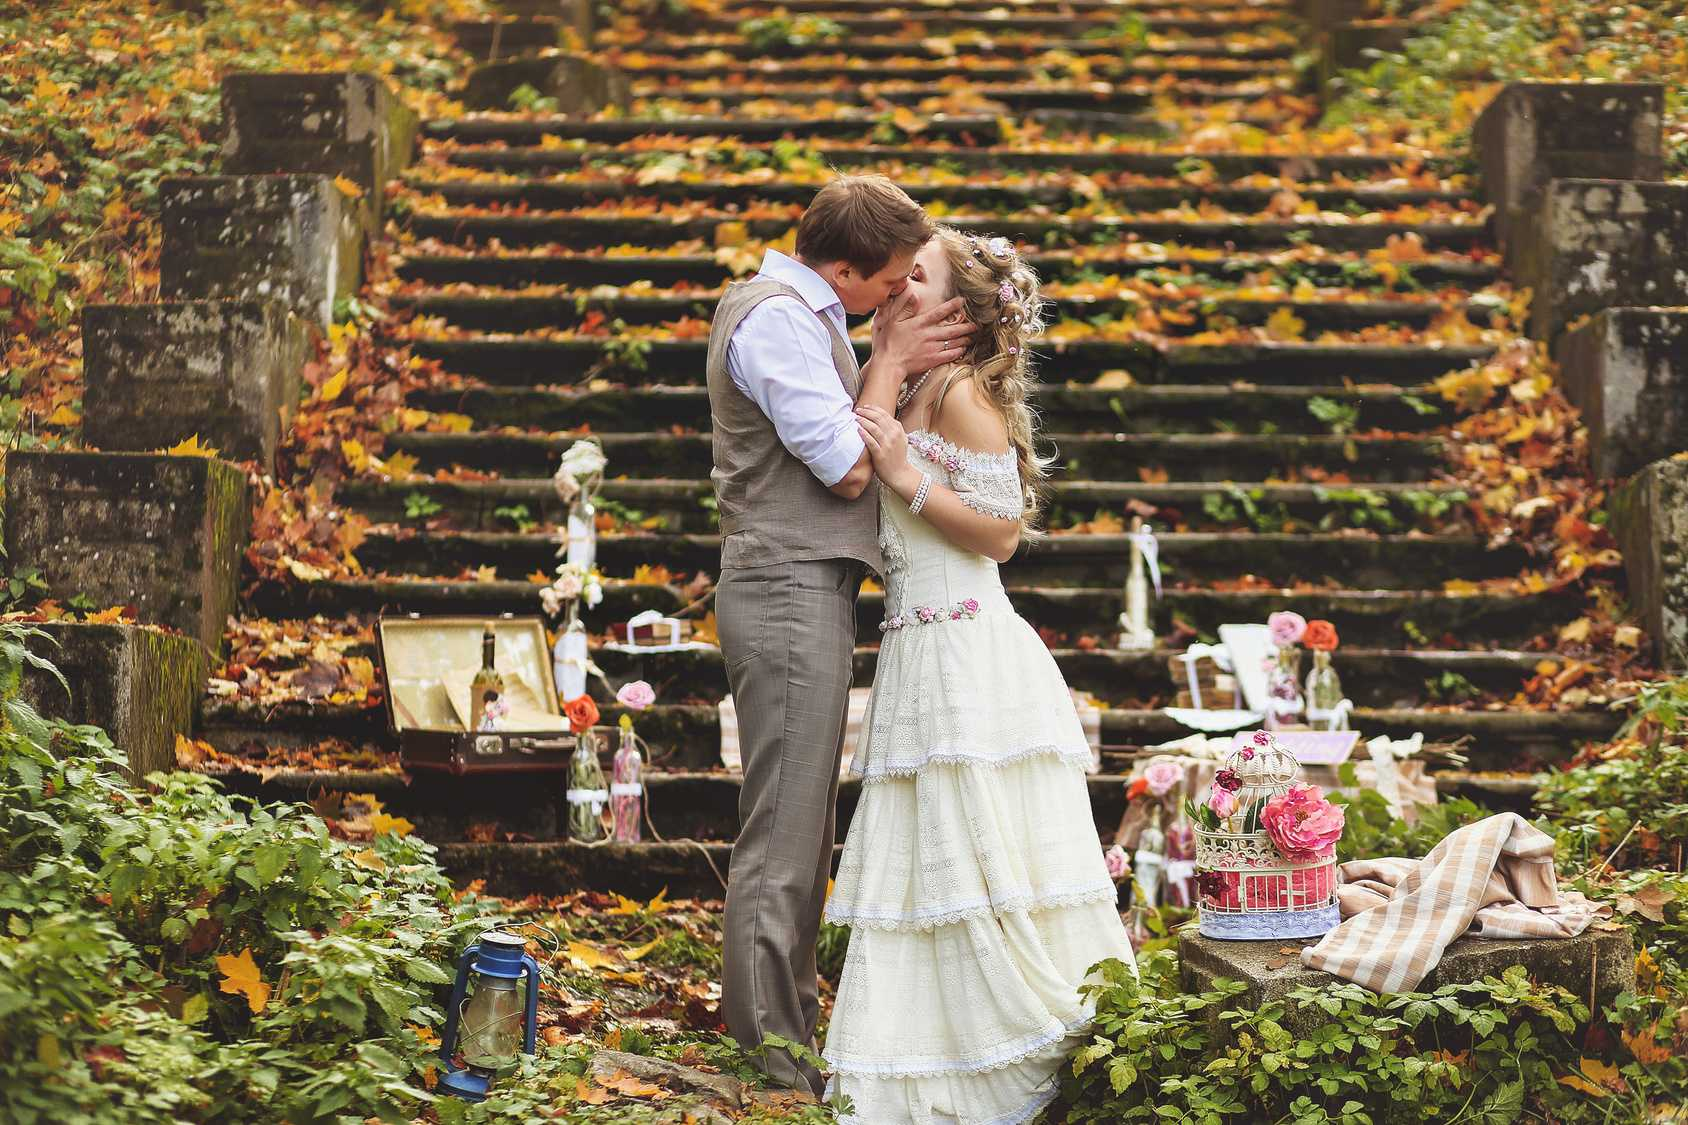 Vestuvės rudenį. Dekoras